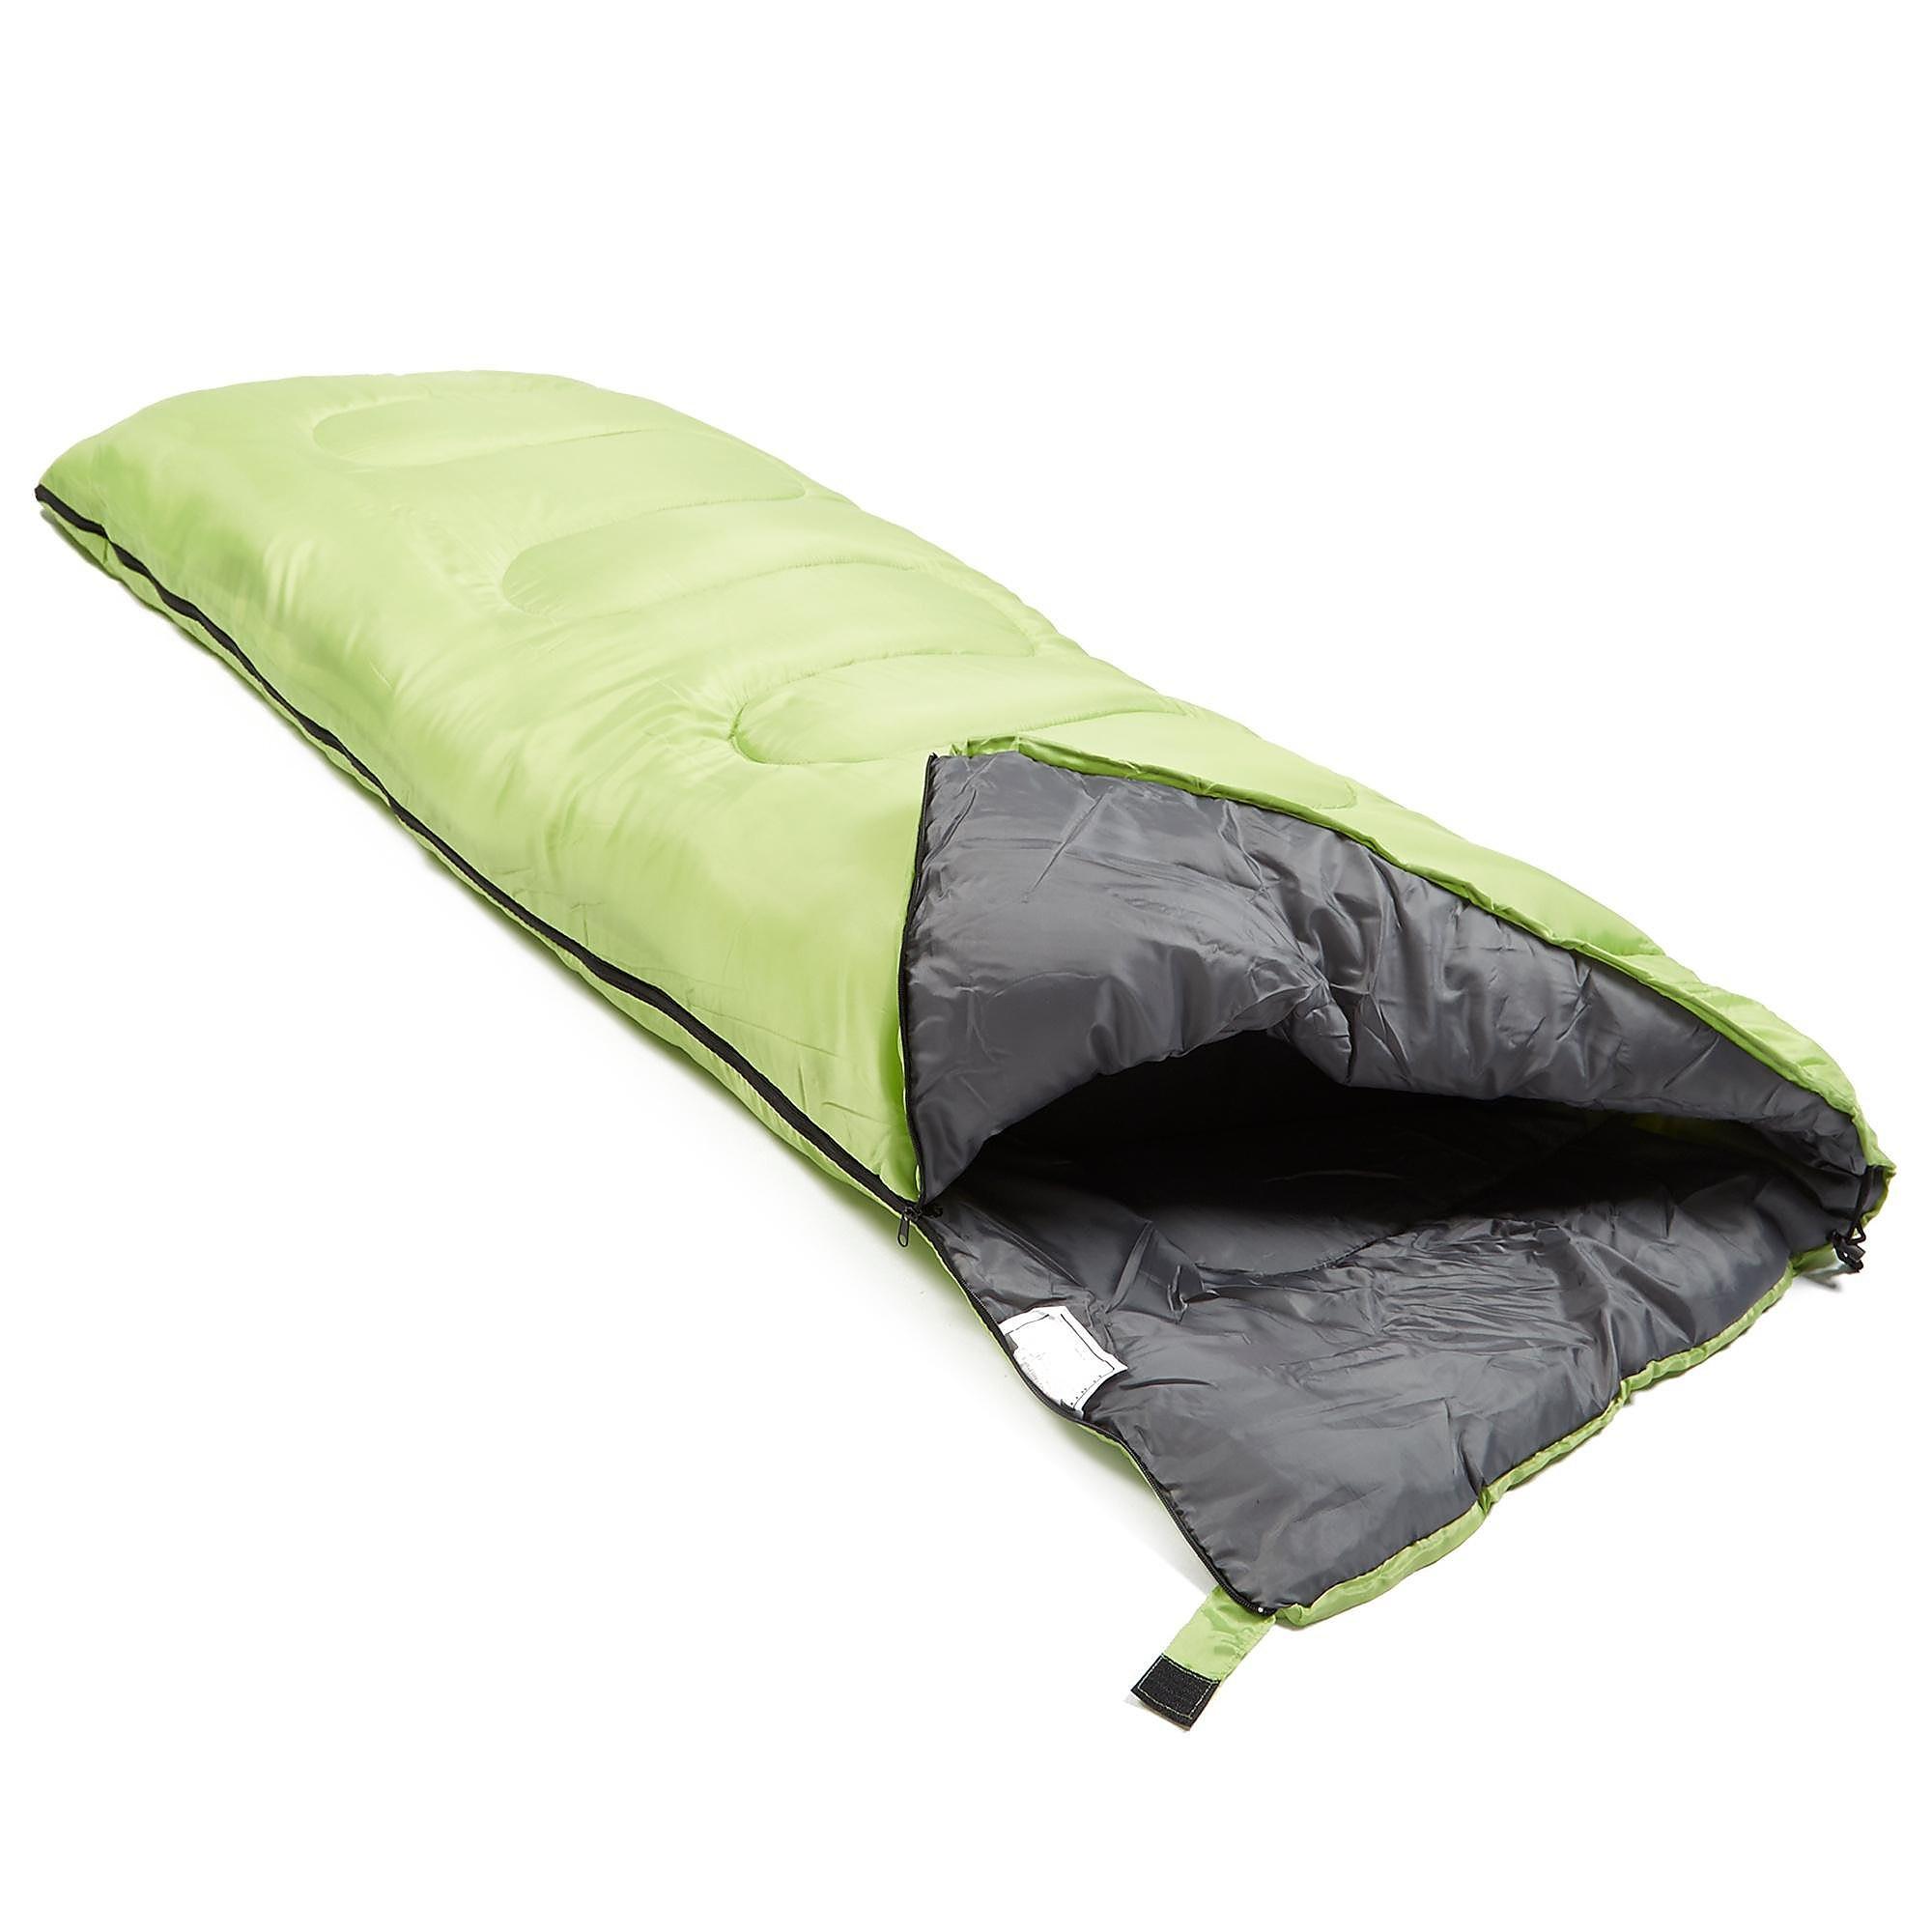 EUROHIKE Super Snooze 250 Sleeping Bag